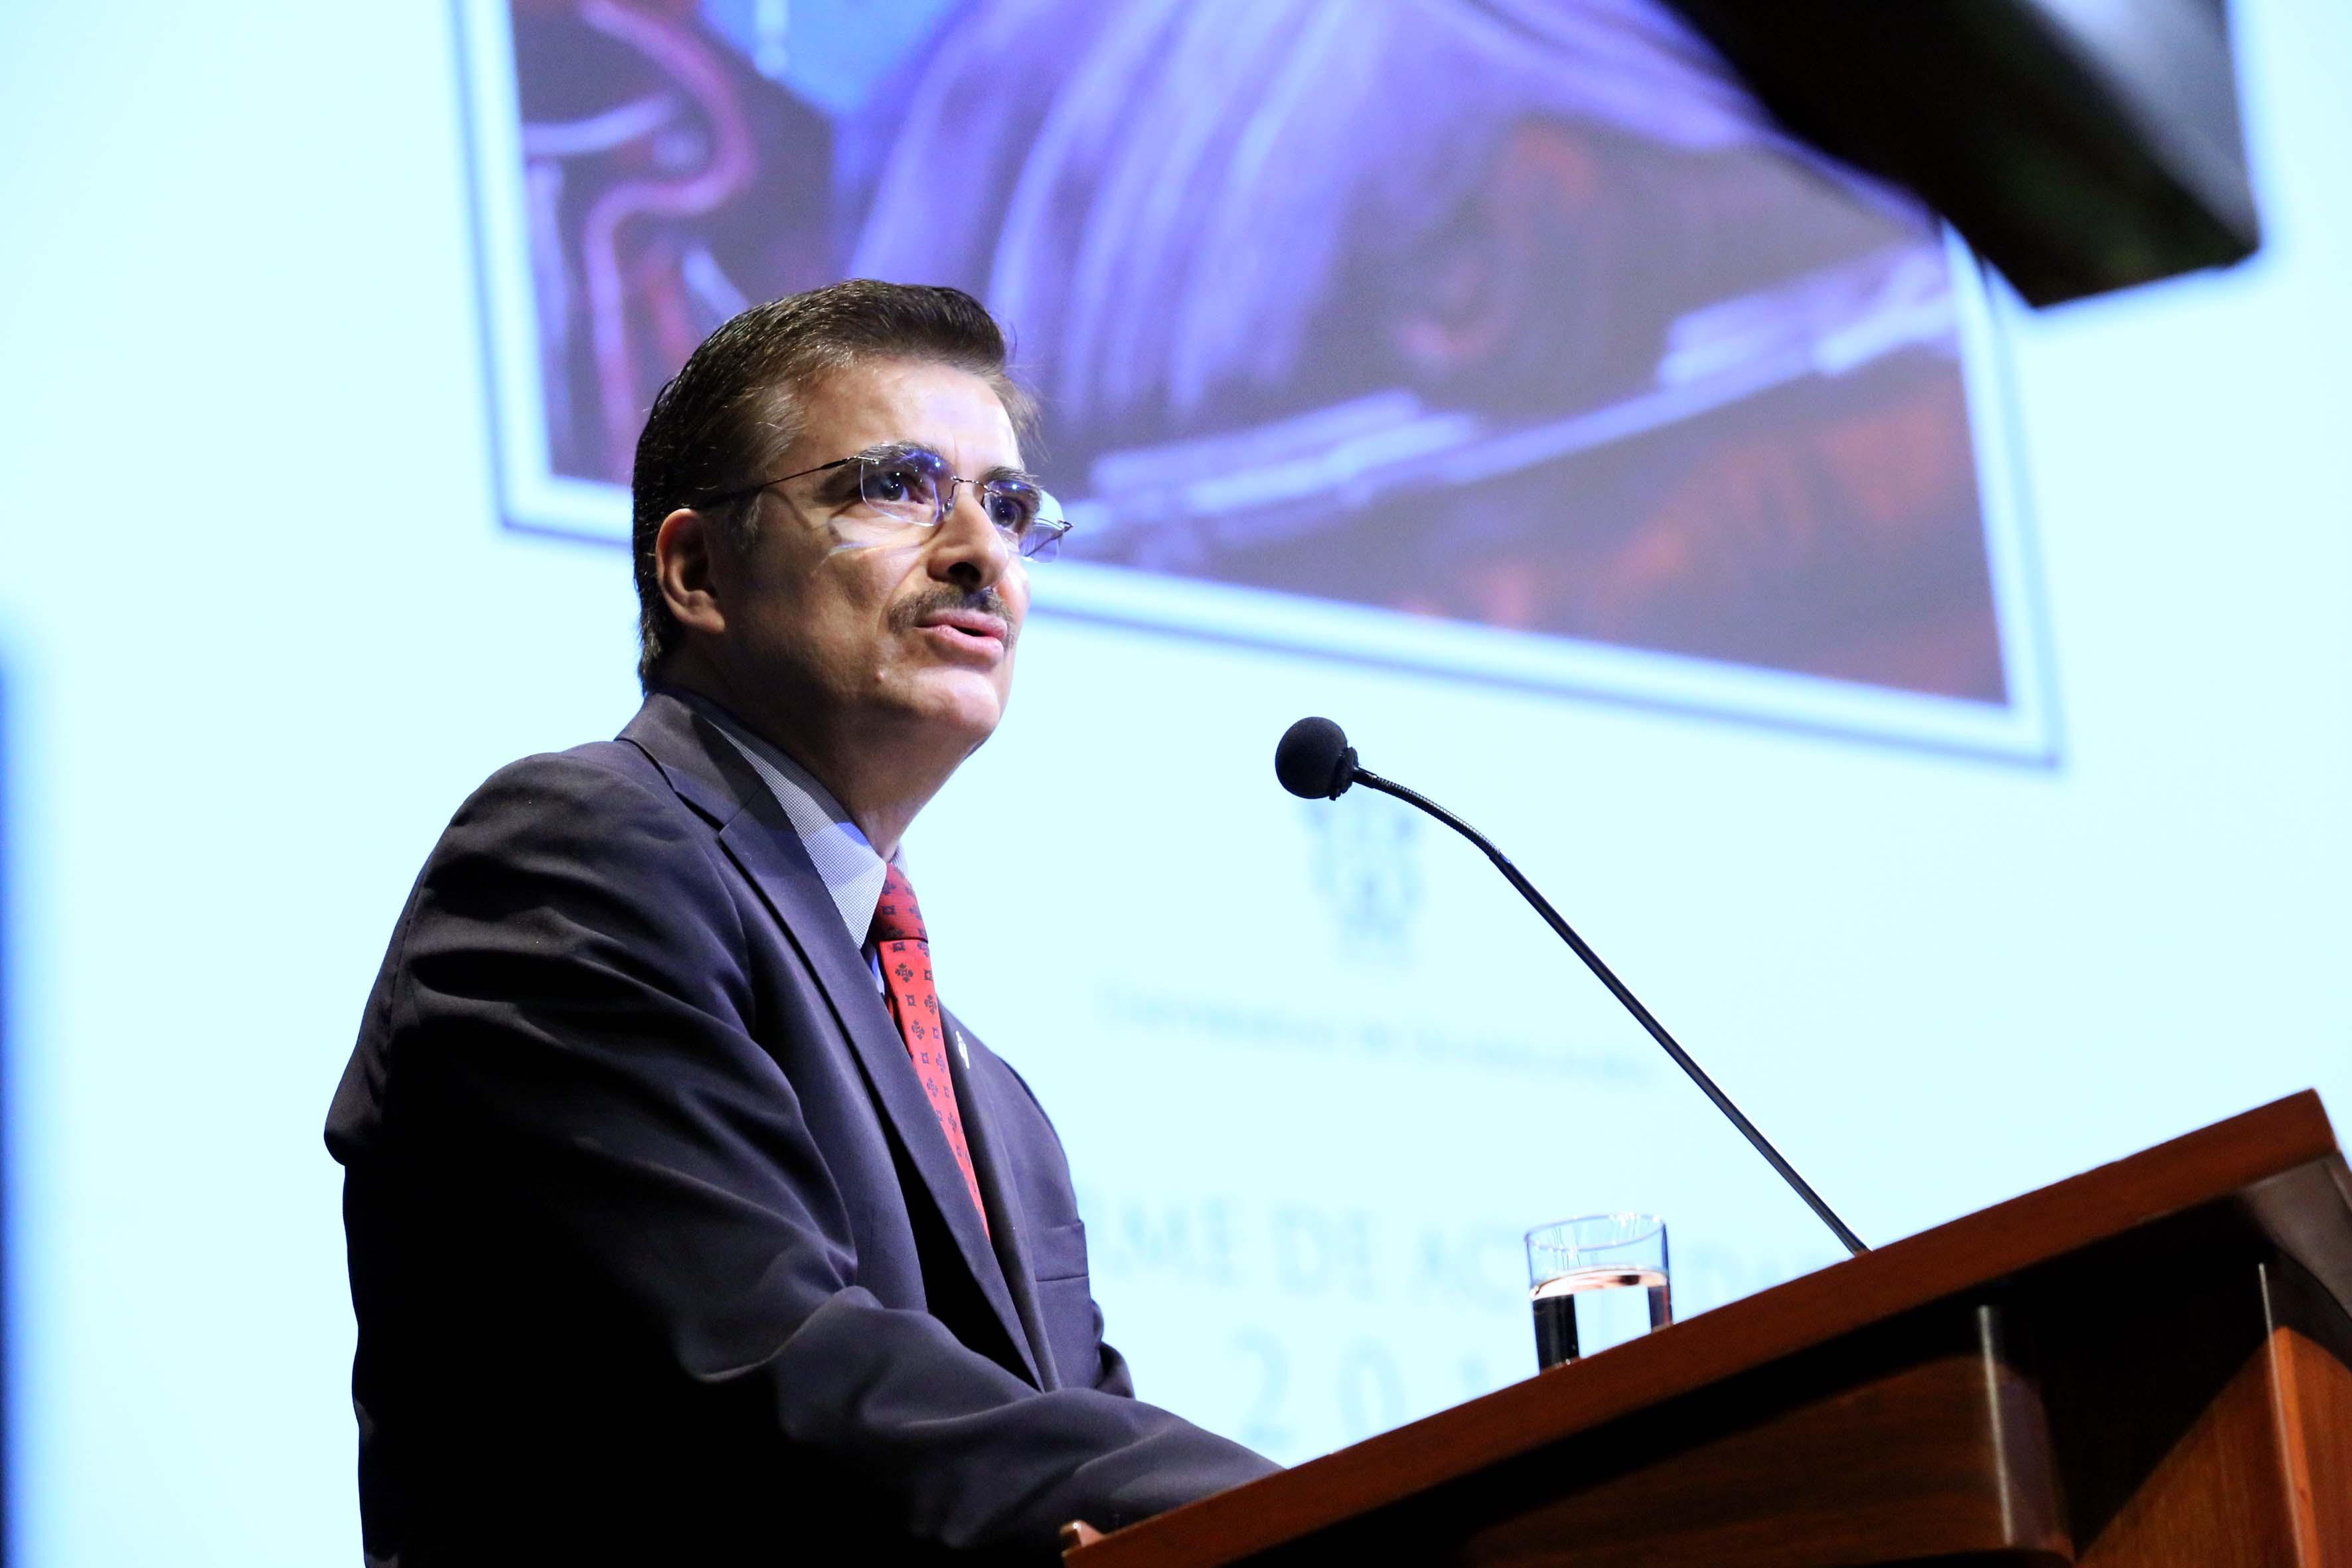 Rector General de la Universidad de Guadalajara, maestro Itzcóatl Tonatiuh Bravo Padilla.